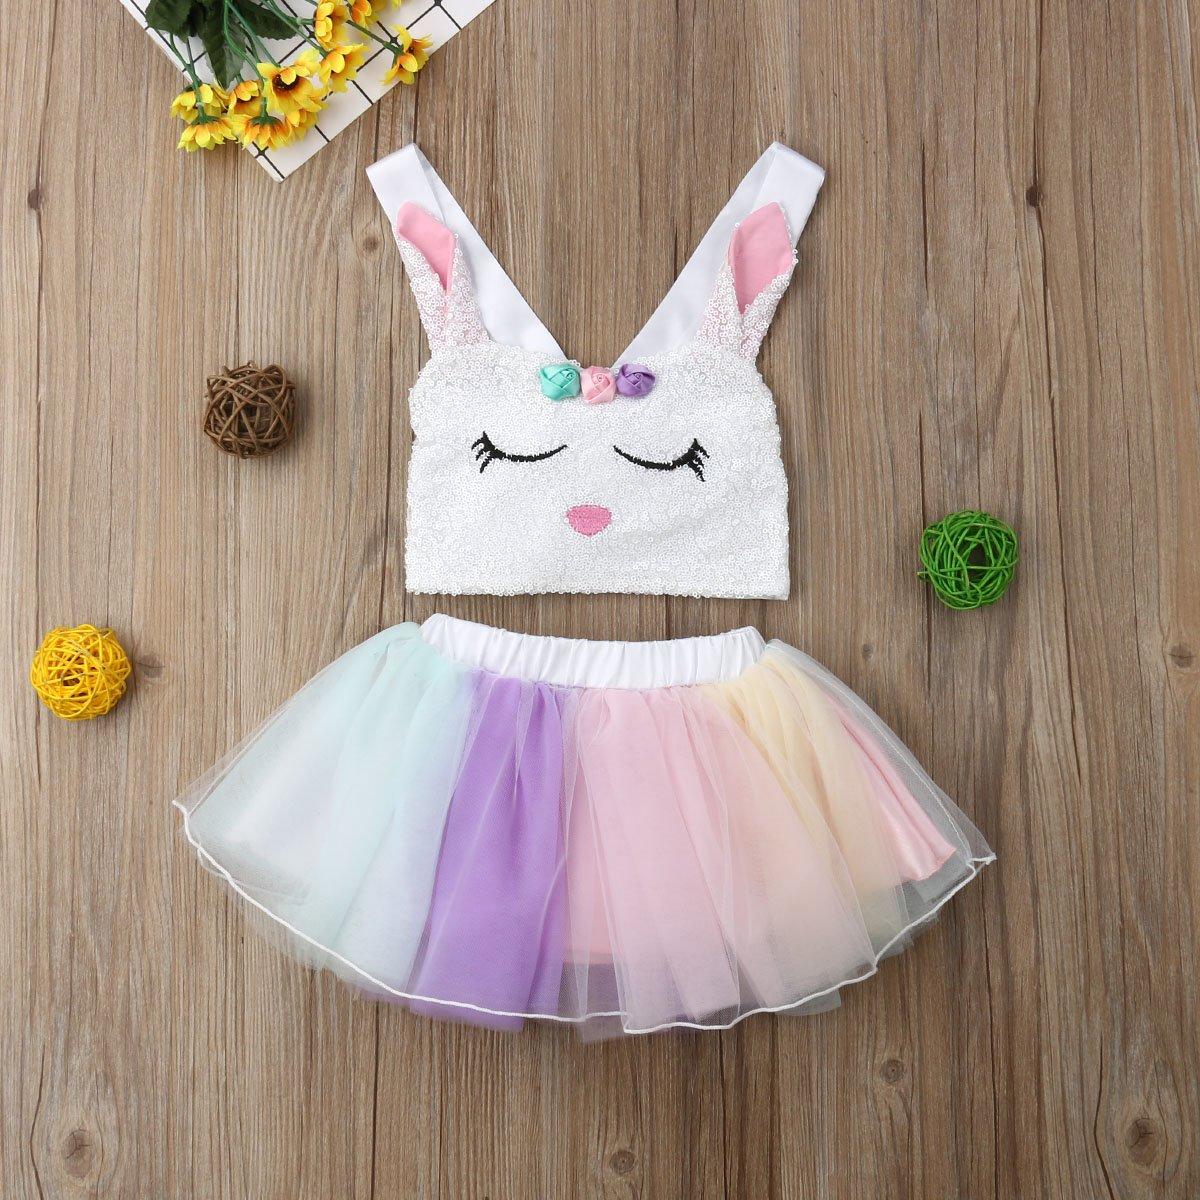 Park Art|My WordPress Blog_Crop Top Dress For Baby Girl